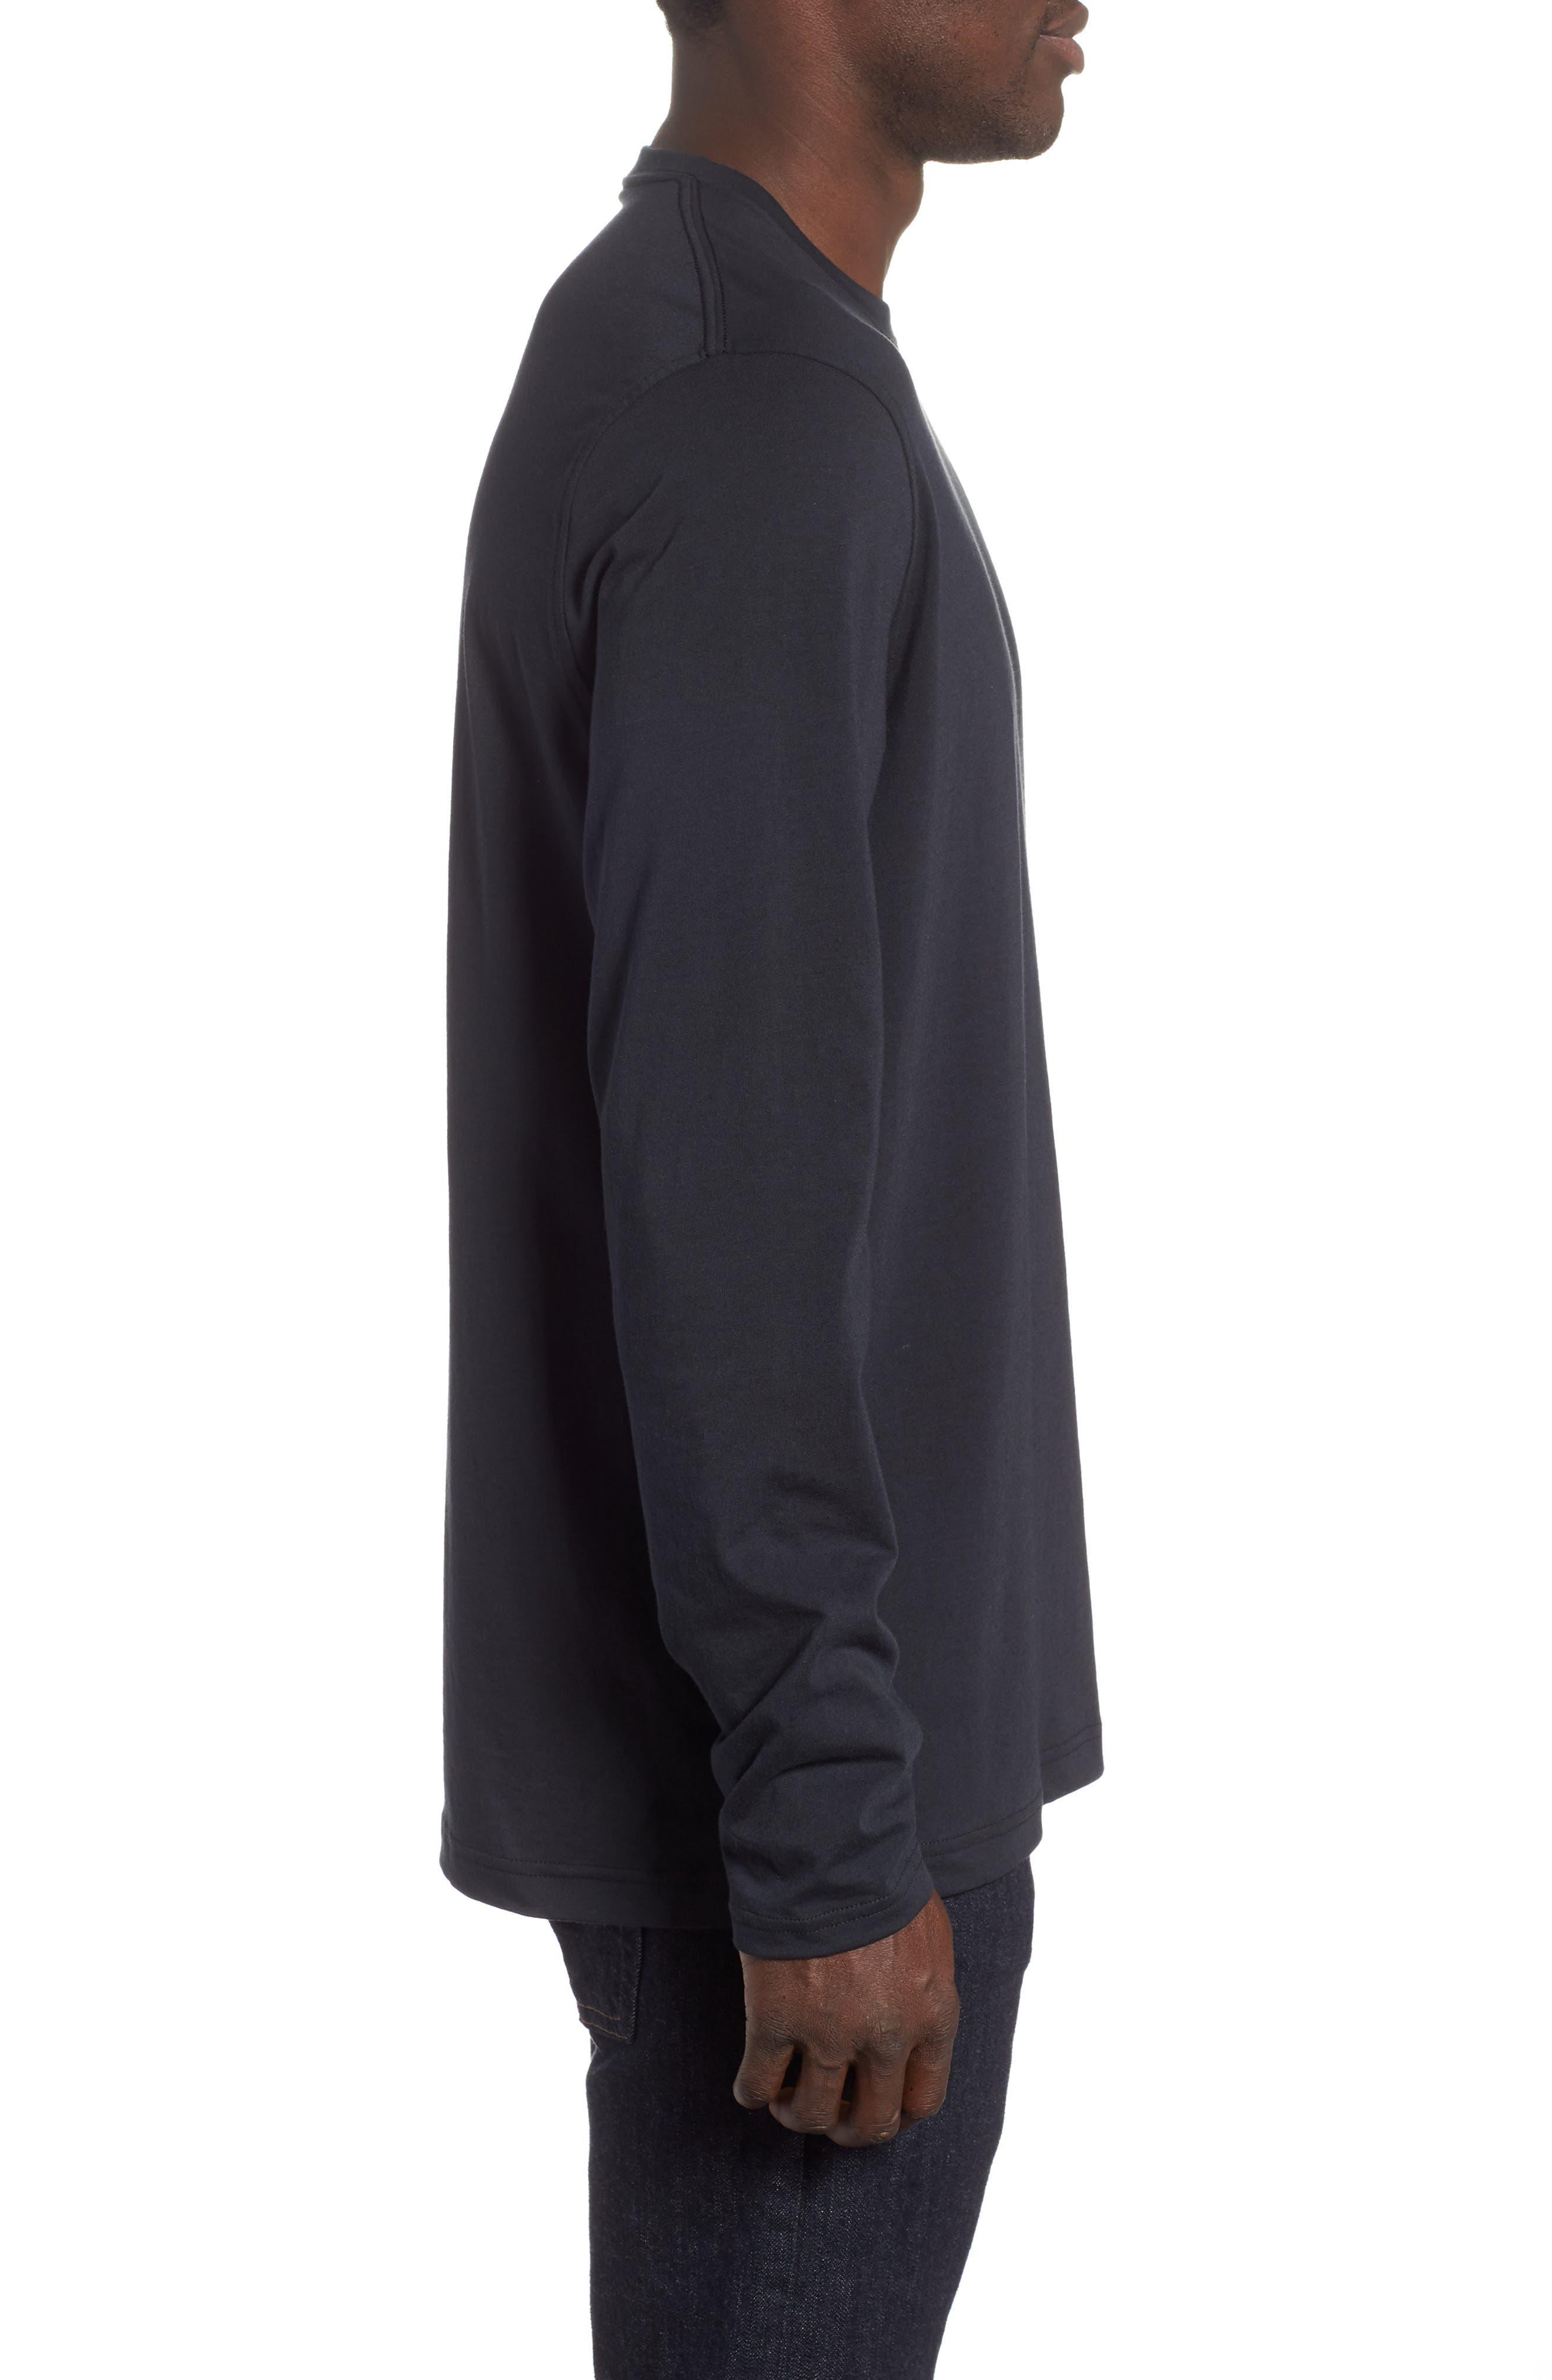 HeatGear<sup>®</sup> Long Sleeve Performance T-Shirt,                             Alternate thumbnail 3, color,                             BLACK/ STEEL